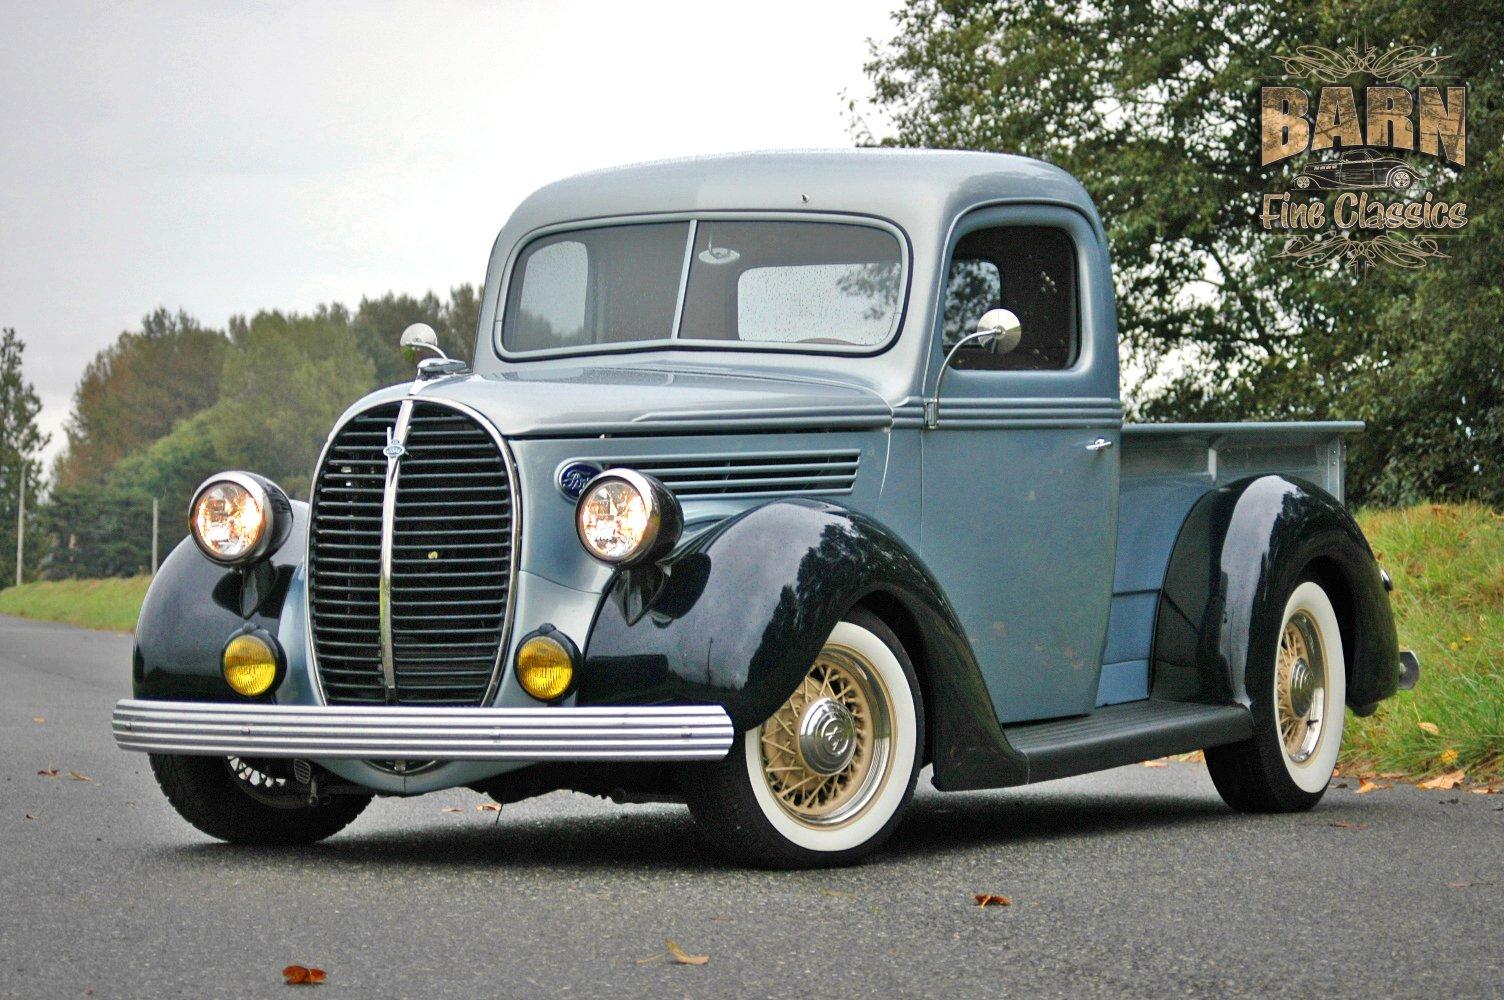 2015 Ford Truck Colors >> 1938 Ford Pickup Hotrod Hod Rod Old School Custom USA 1500x1000-19 wallpaper | 1504x1000 ...